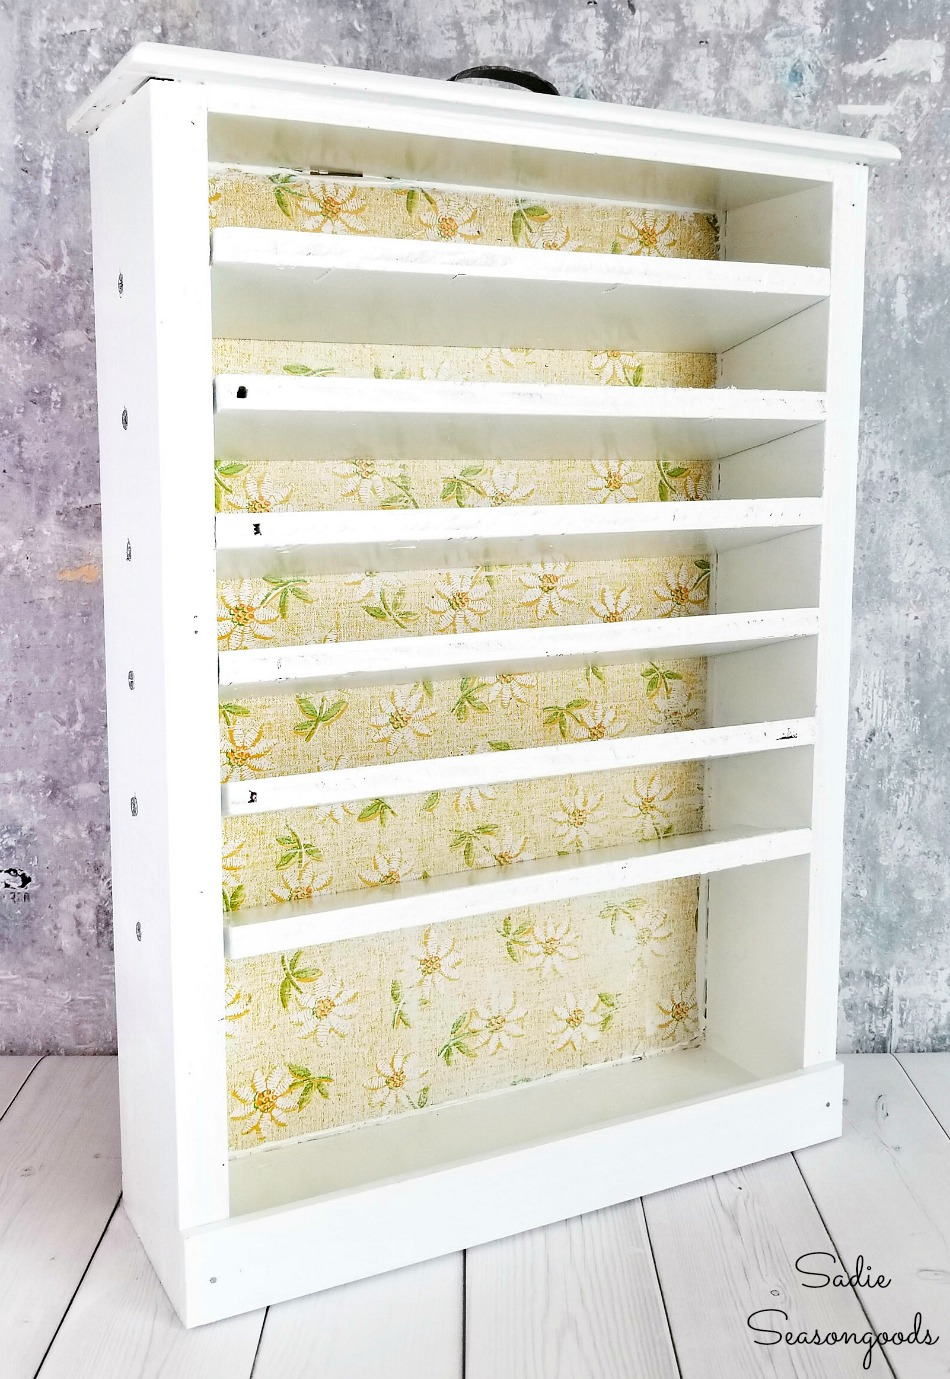 Craft paint organizer with beveled shelves